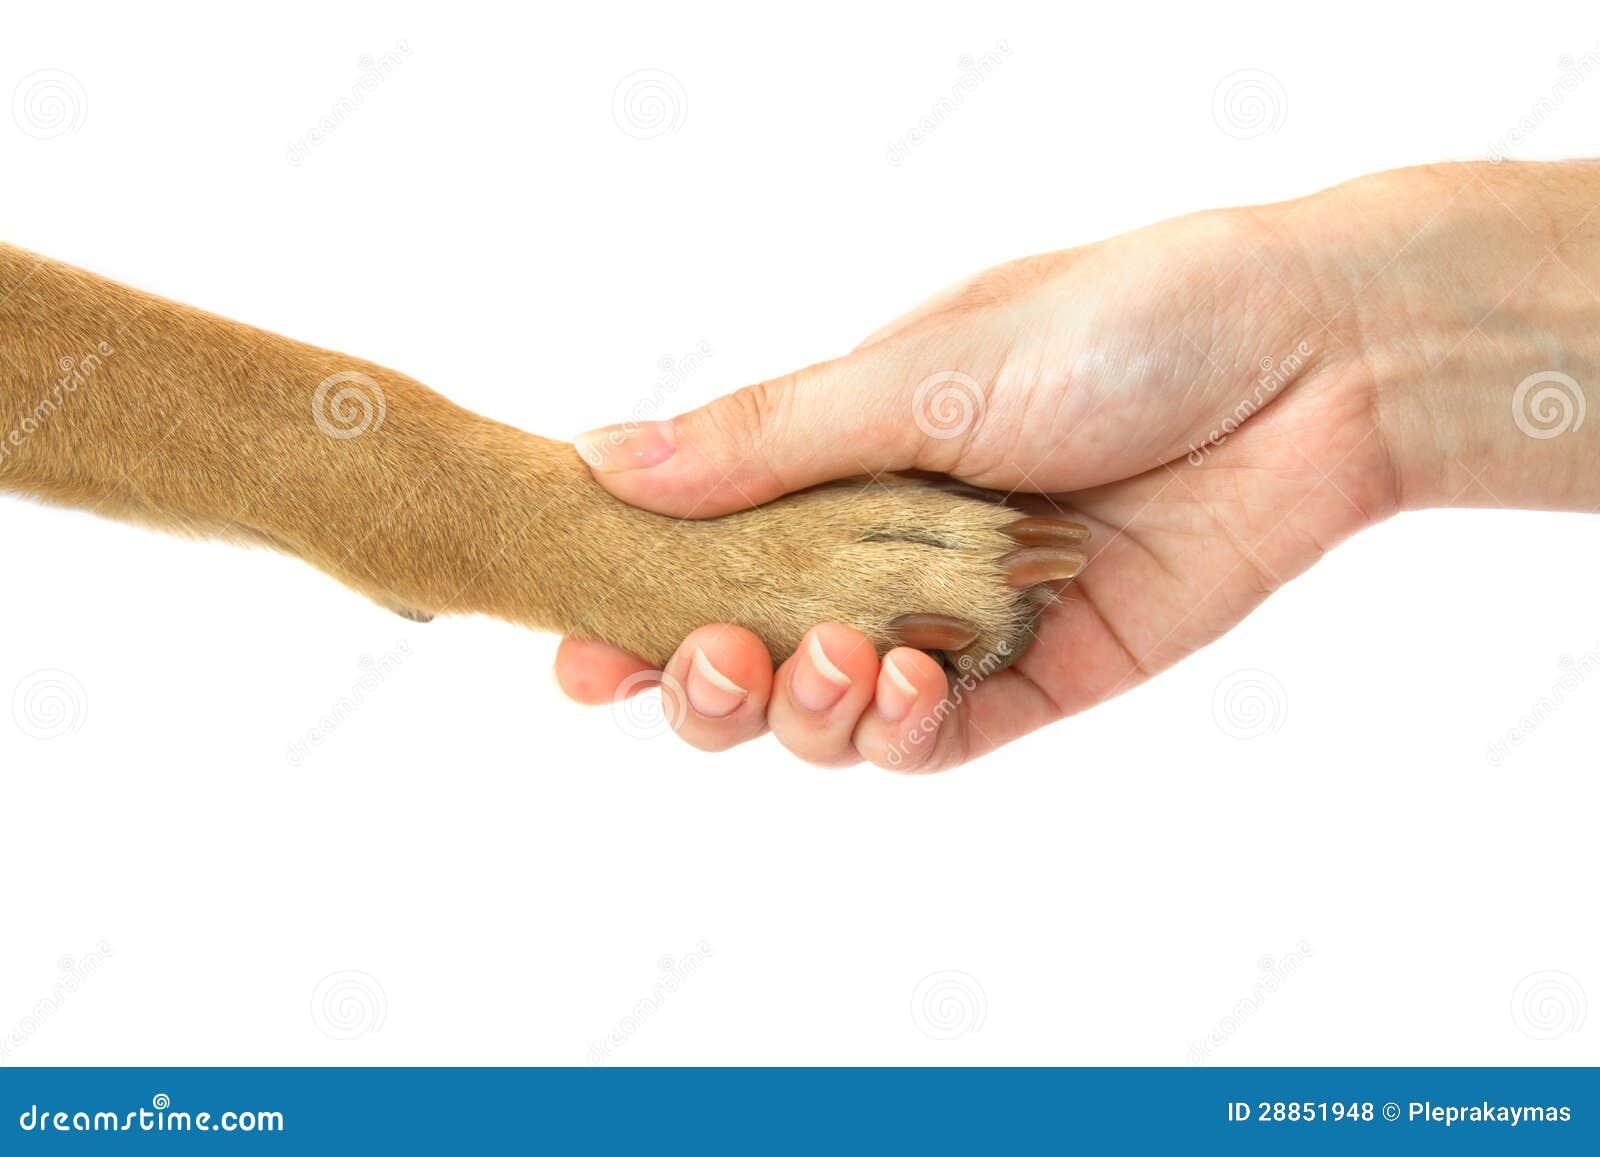 Puppy anatomy female